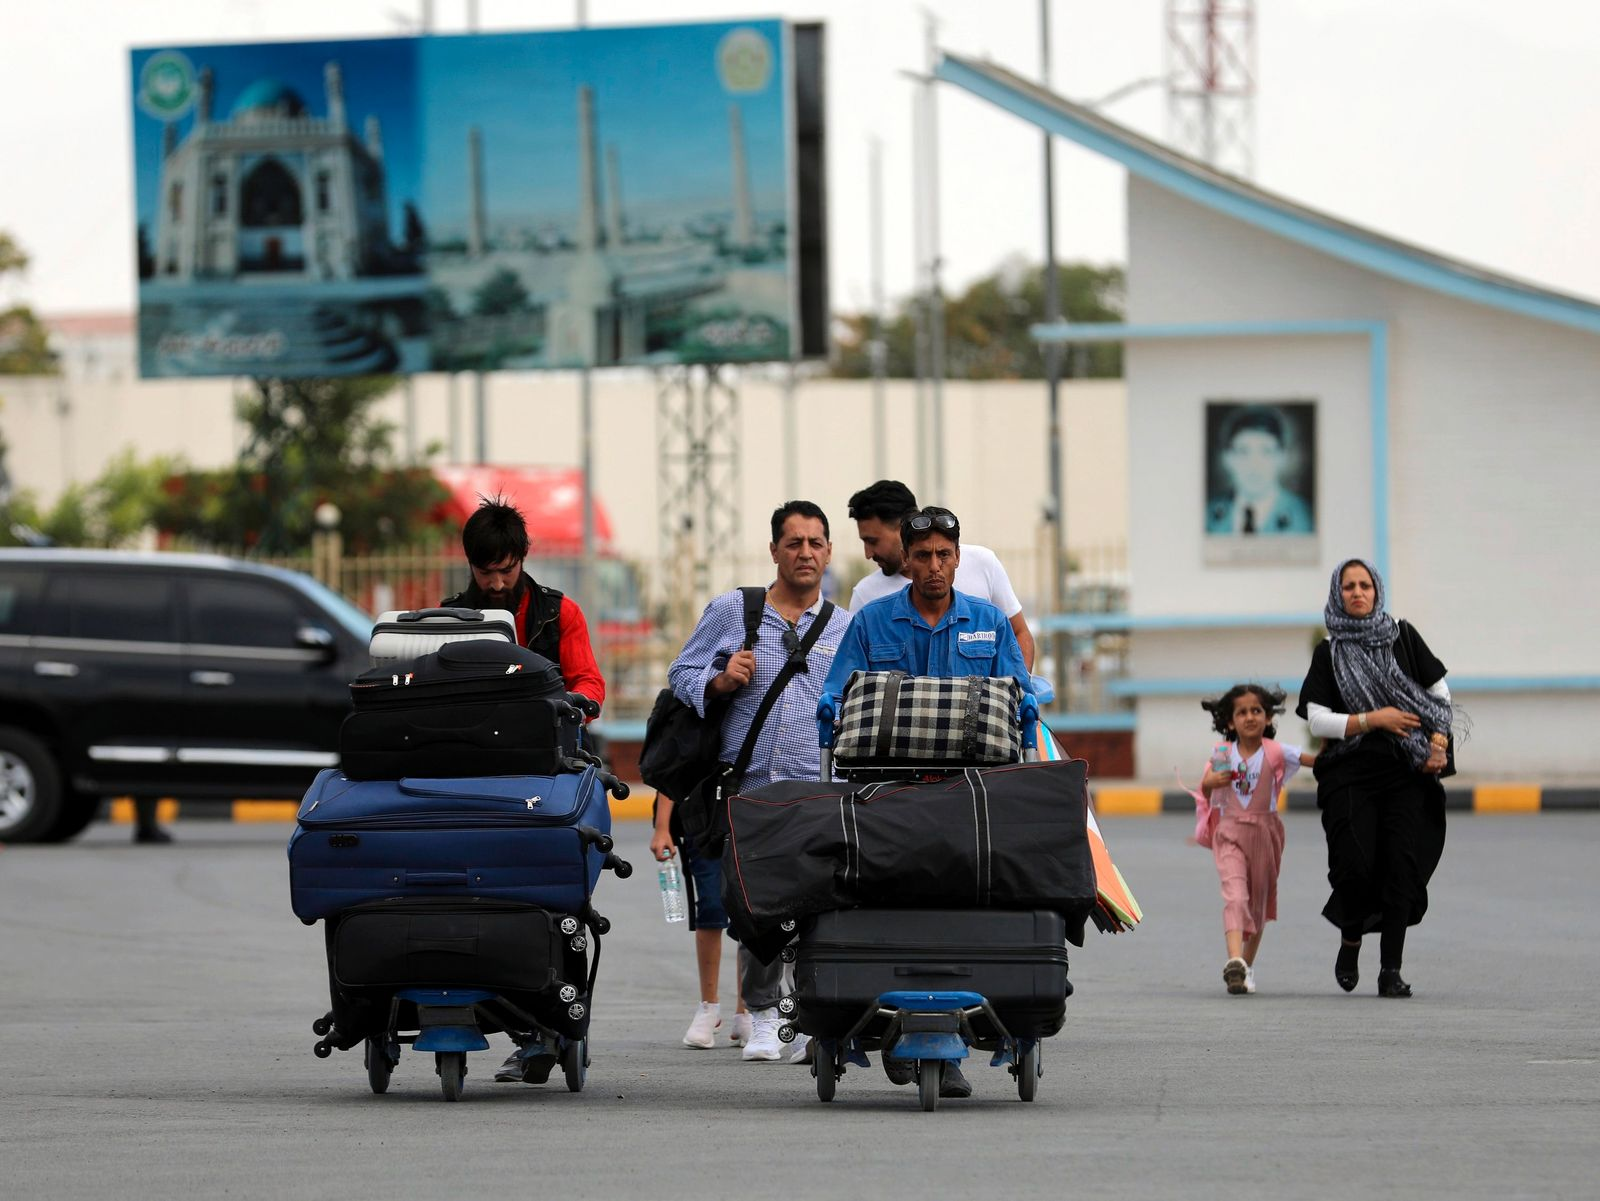 Afghanistan - Flughafen Kabul